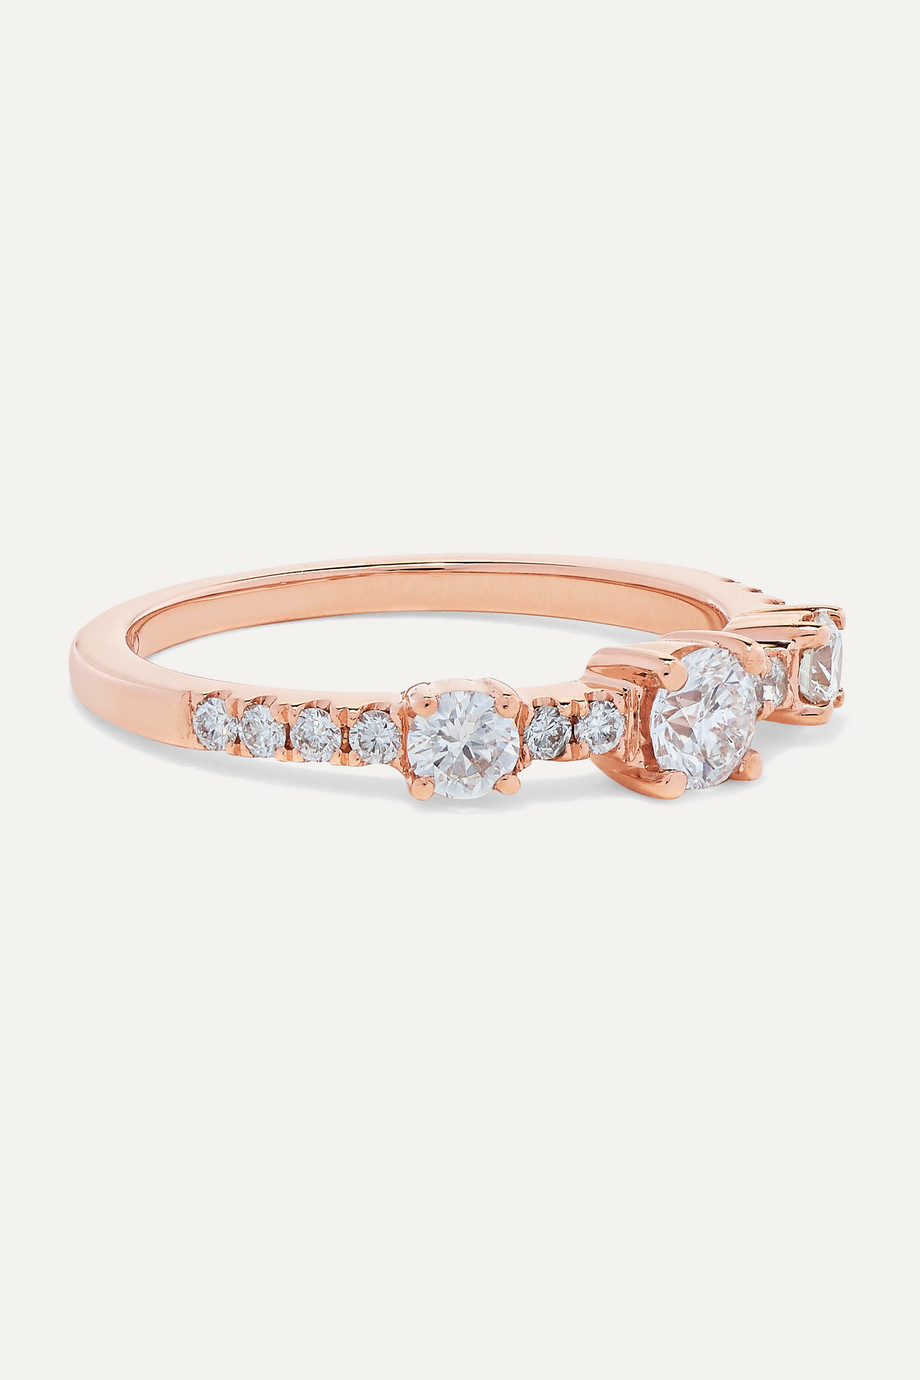 Anita Ko Collins 18K 玫瑰金钻石戒指